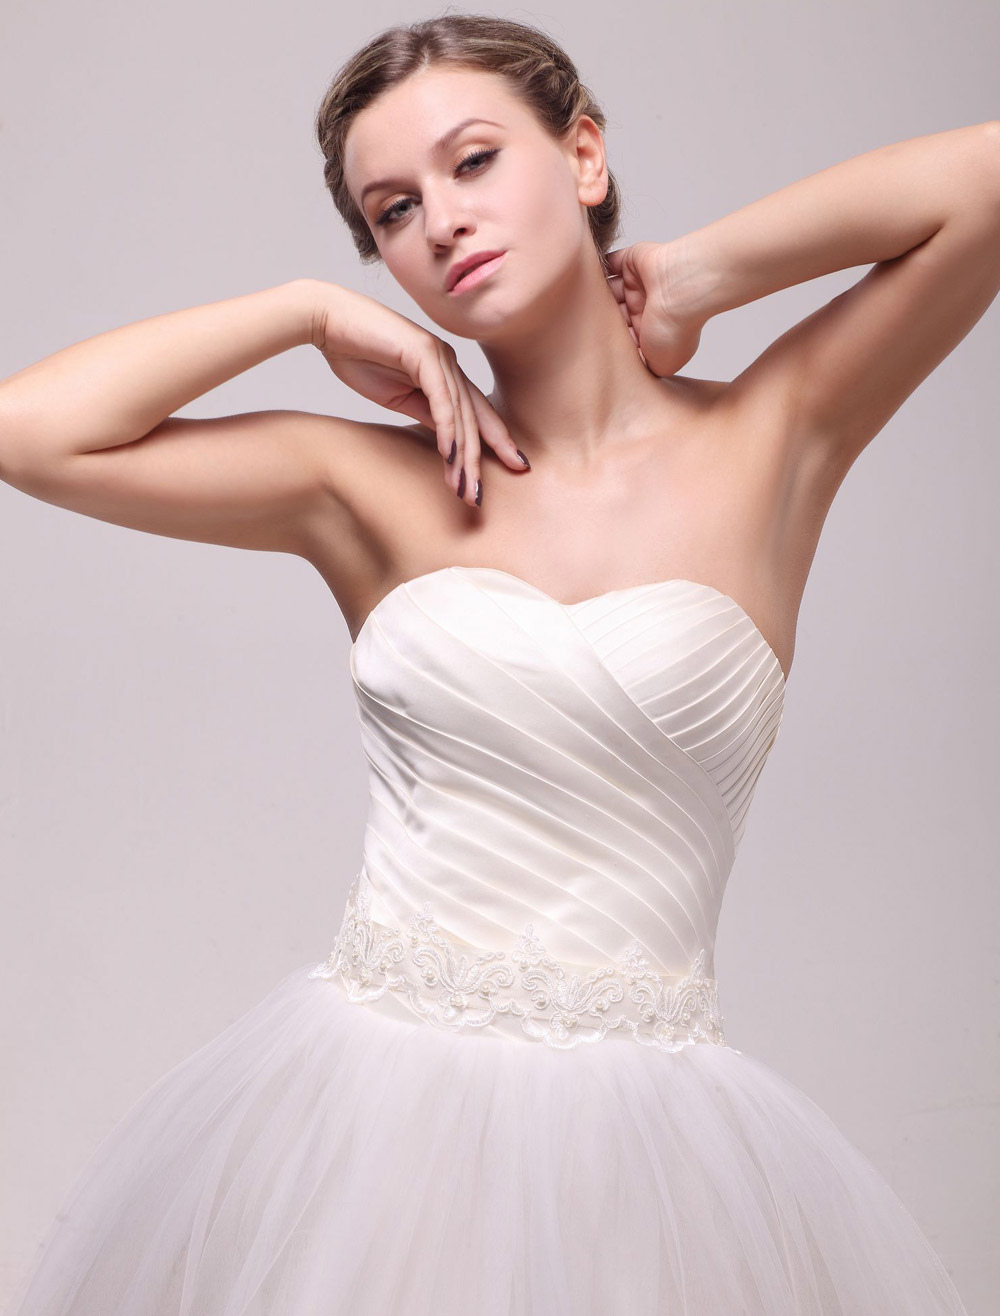 Buy Pretty Ivory Shiny Applique Medium Bridal Wedding Sash for $10.19 in Milanoo store